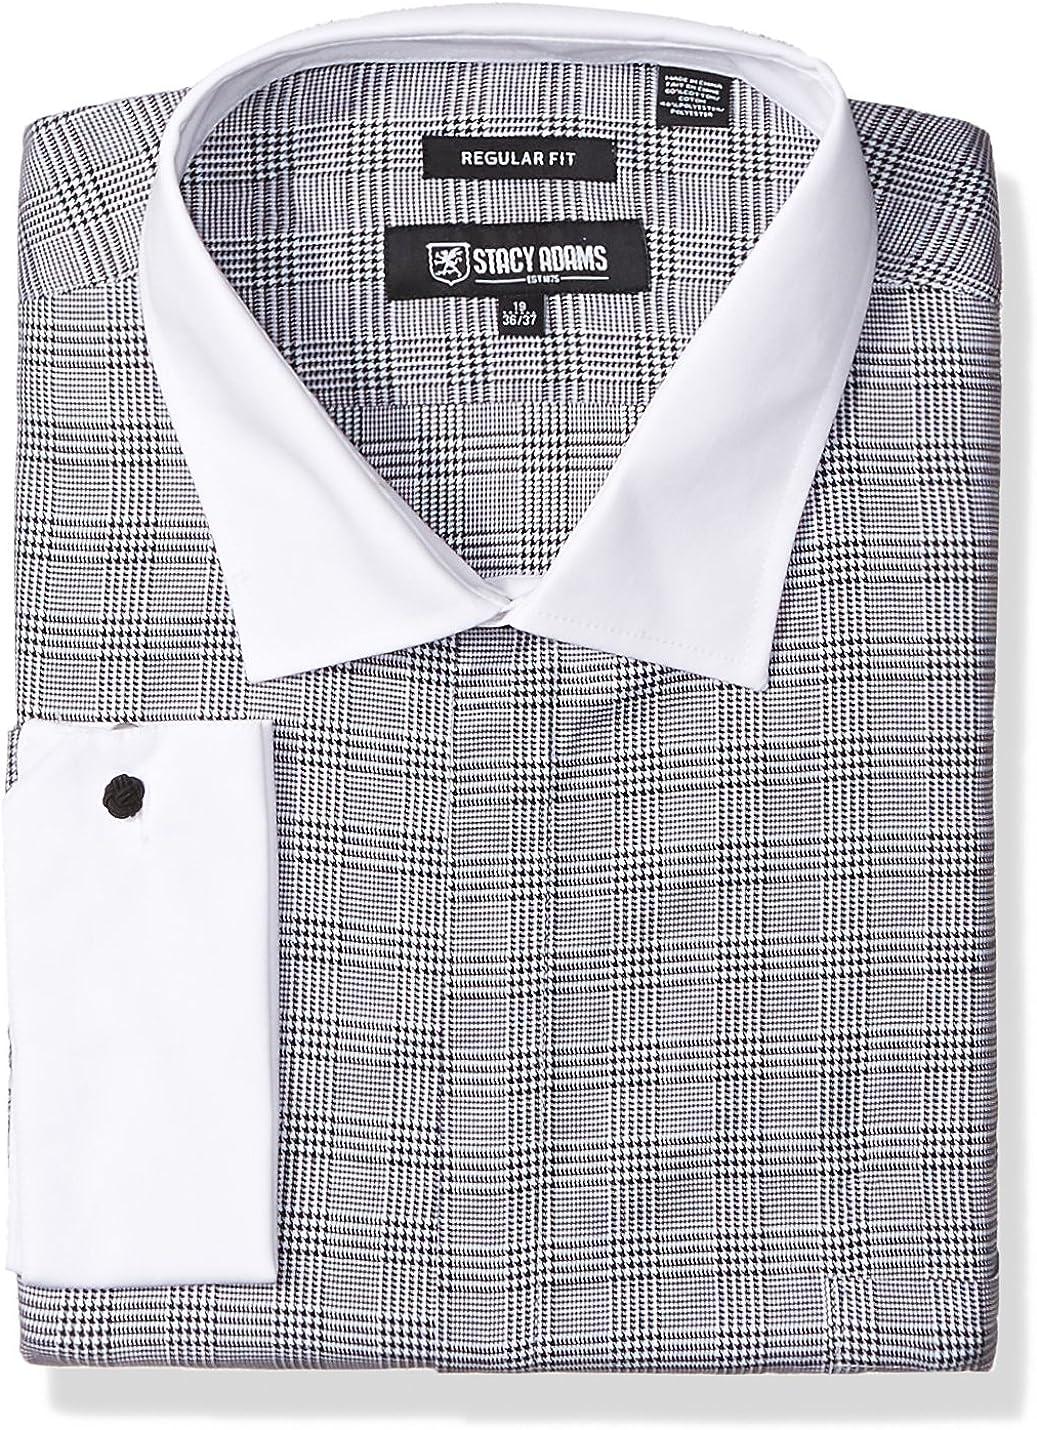 STACY ADAMS Men's Big and Tall Big & Tall Large Glen Check Classic Fit Dress Shirt